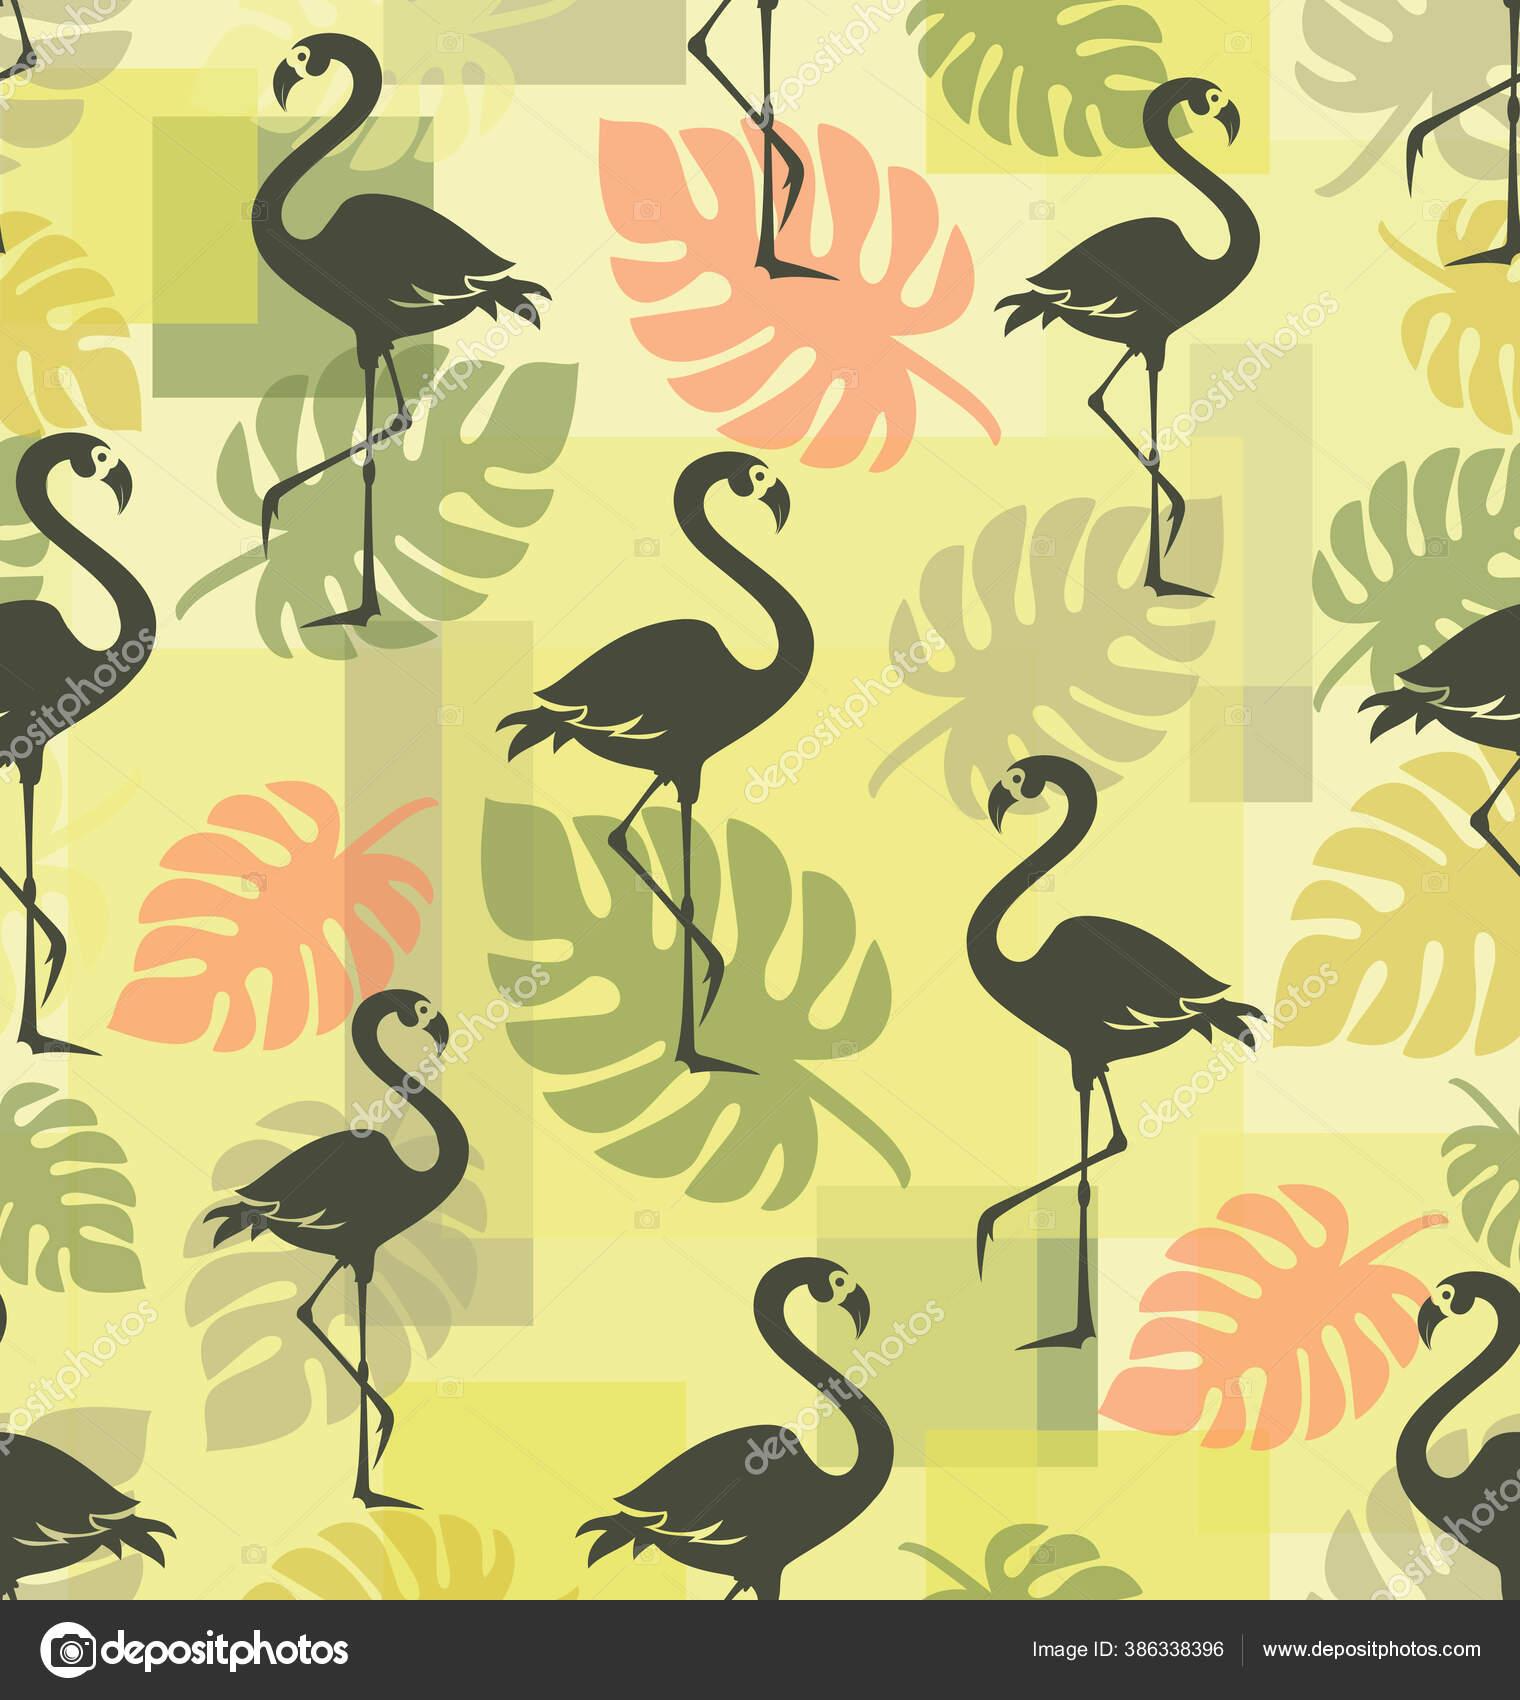 depositphotos 386338396 stock illustration tropical background flamingo silhouette monstera